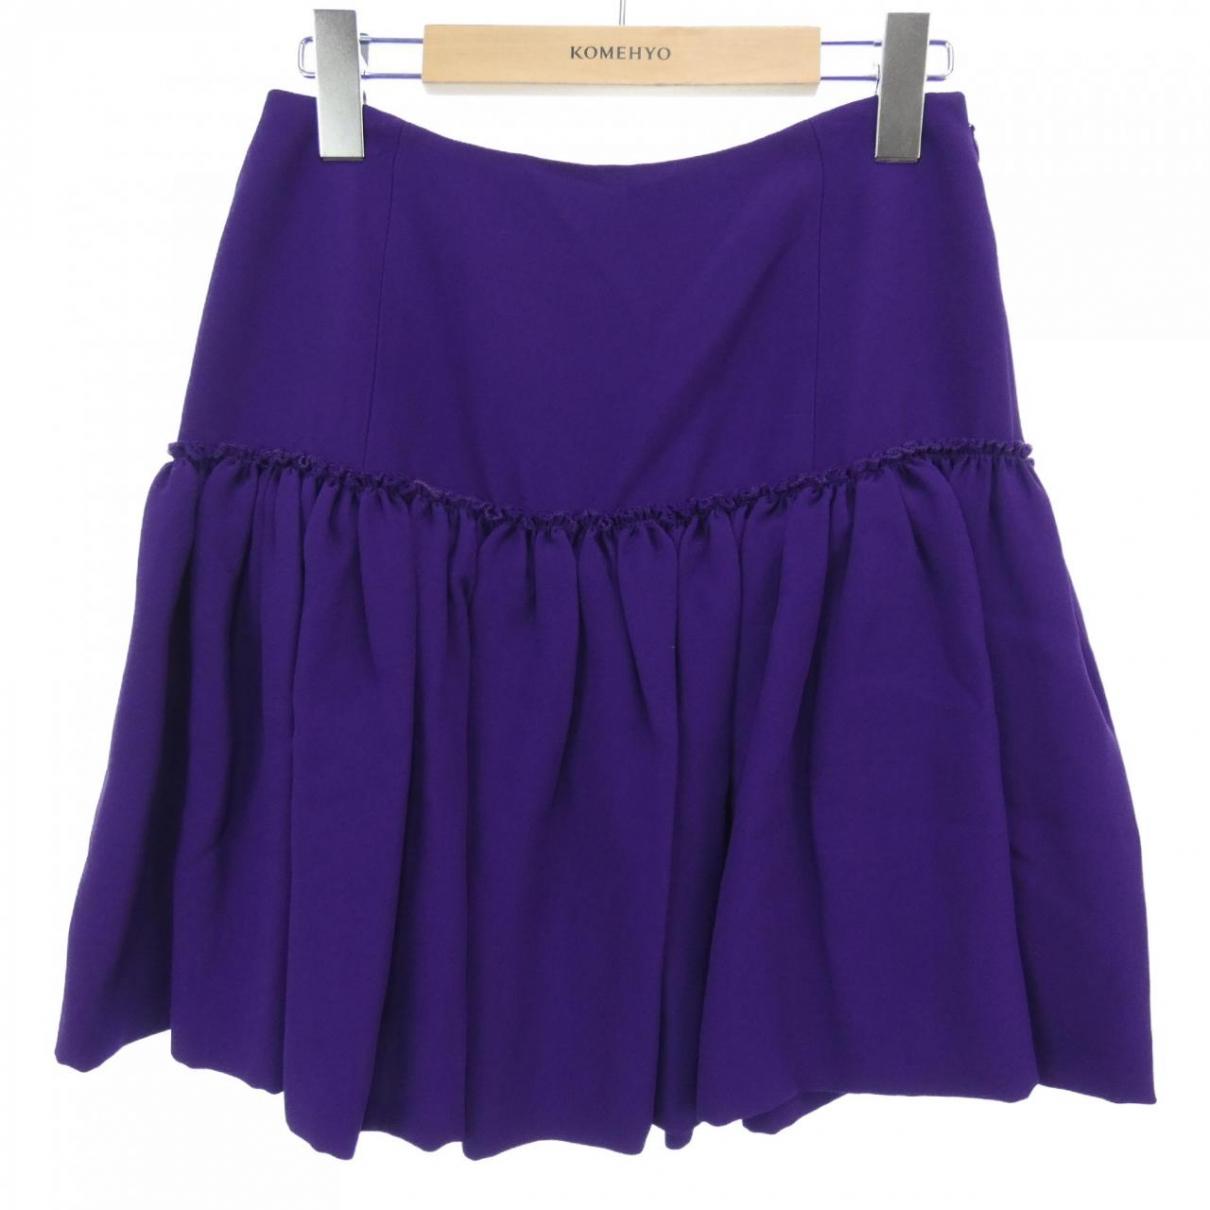 Miu Miu - Jupe   pour femme - violet